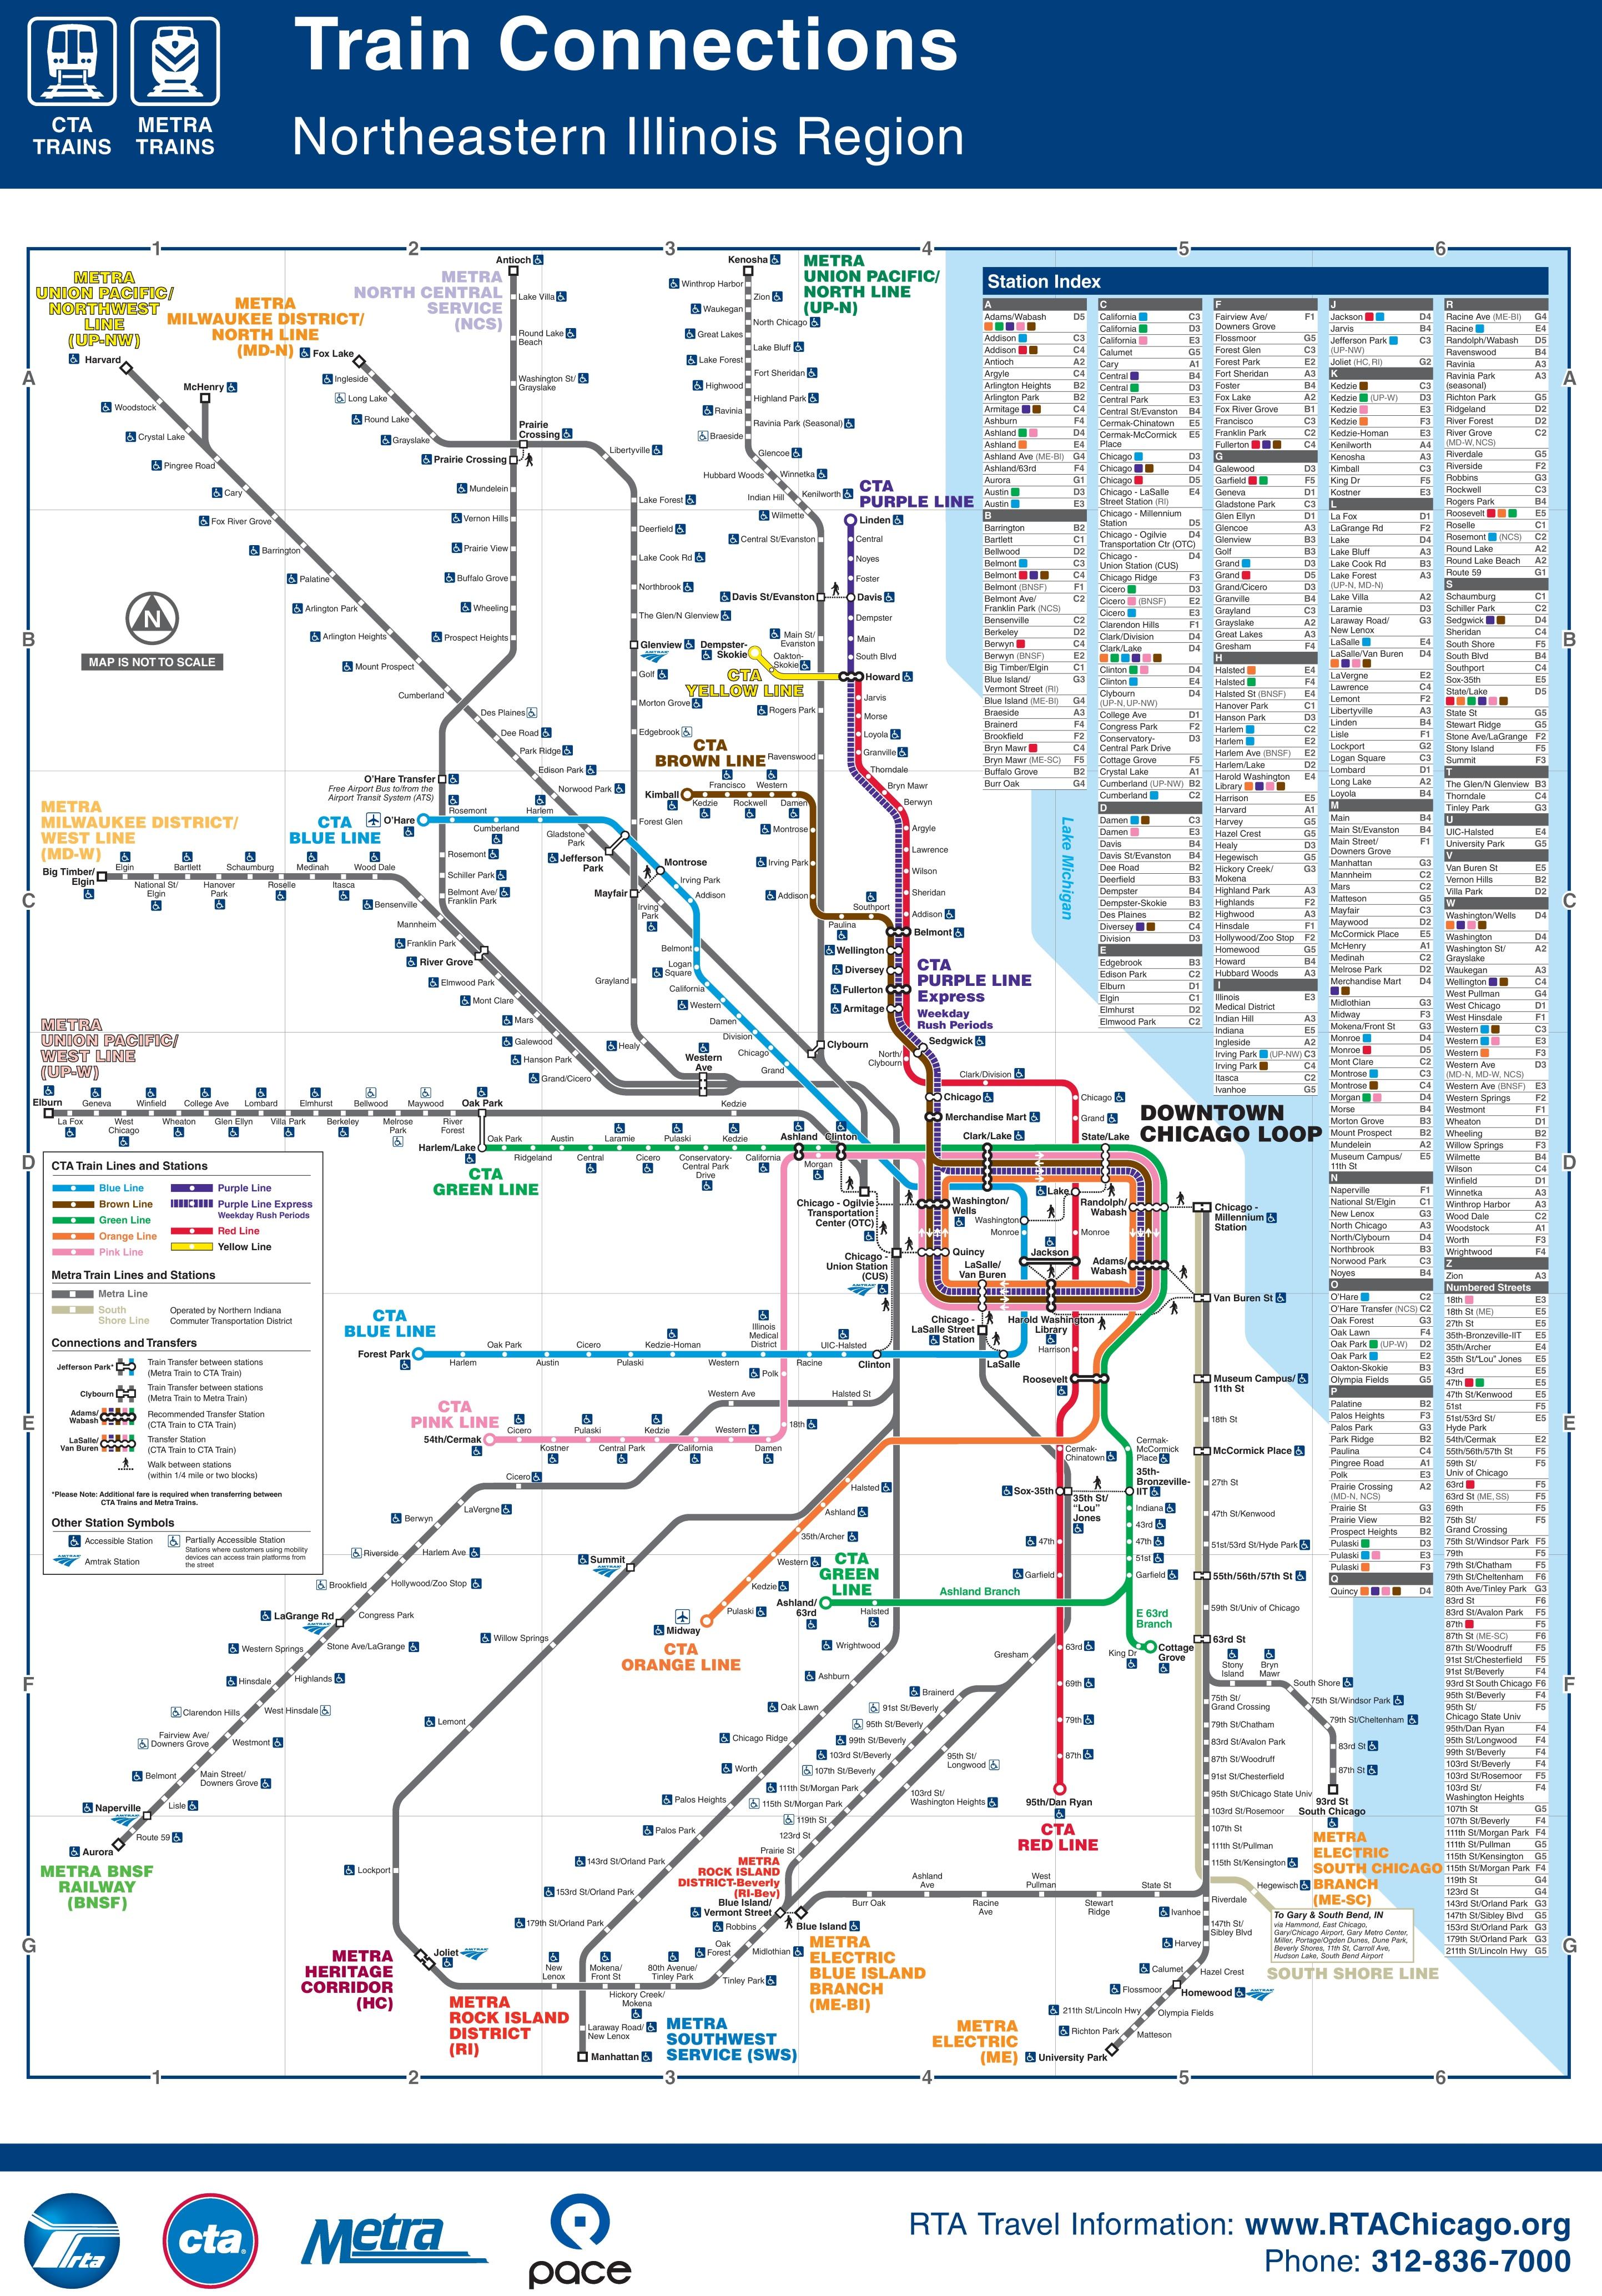 Chicago Subway Map Chicago CTA, Metra and subway map Chicago Subway Map